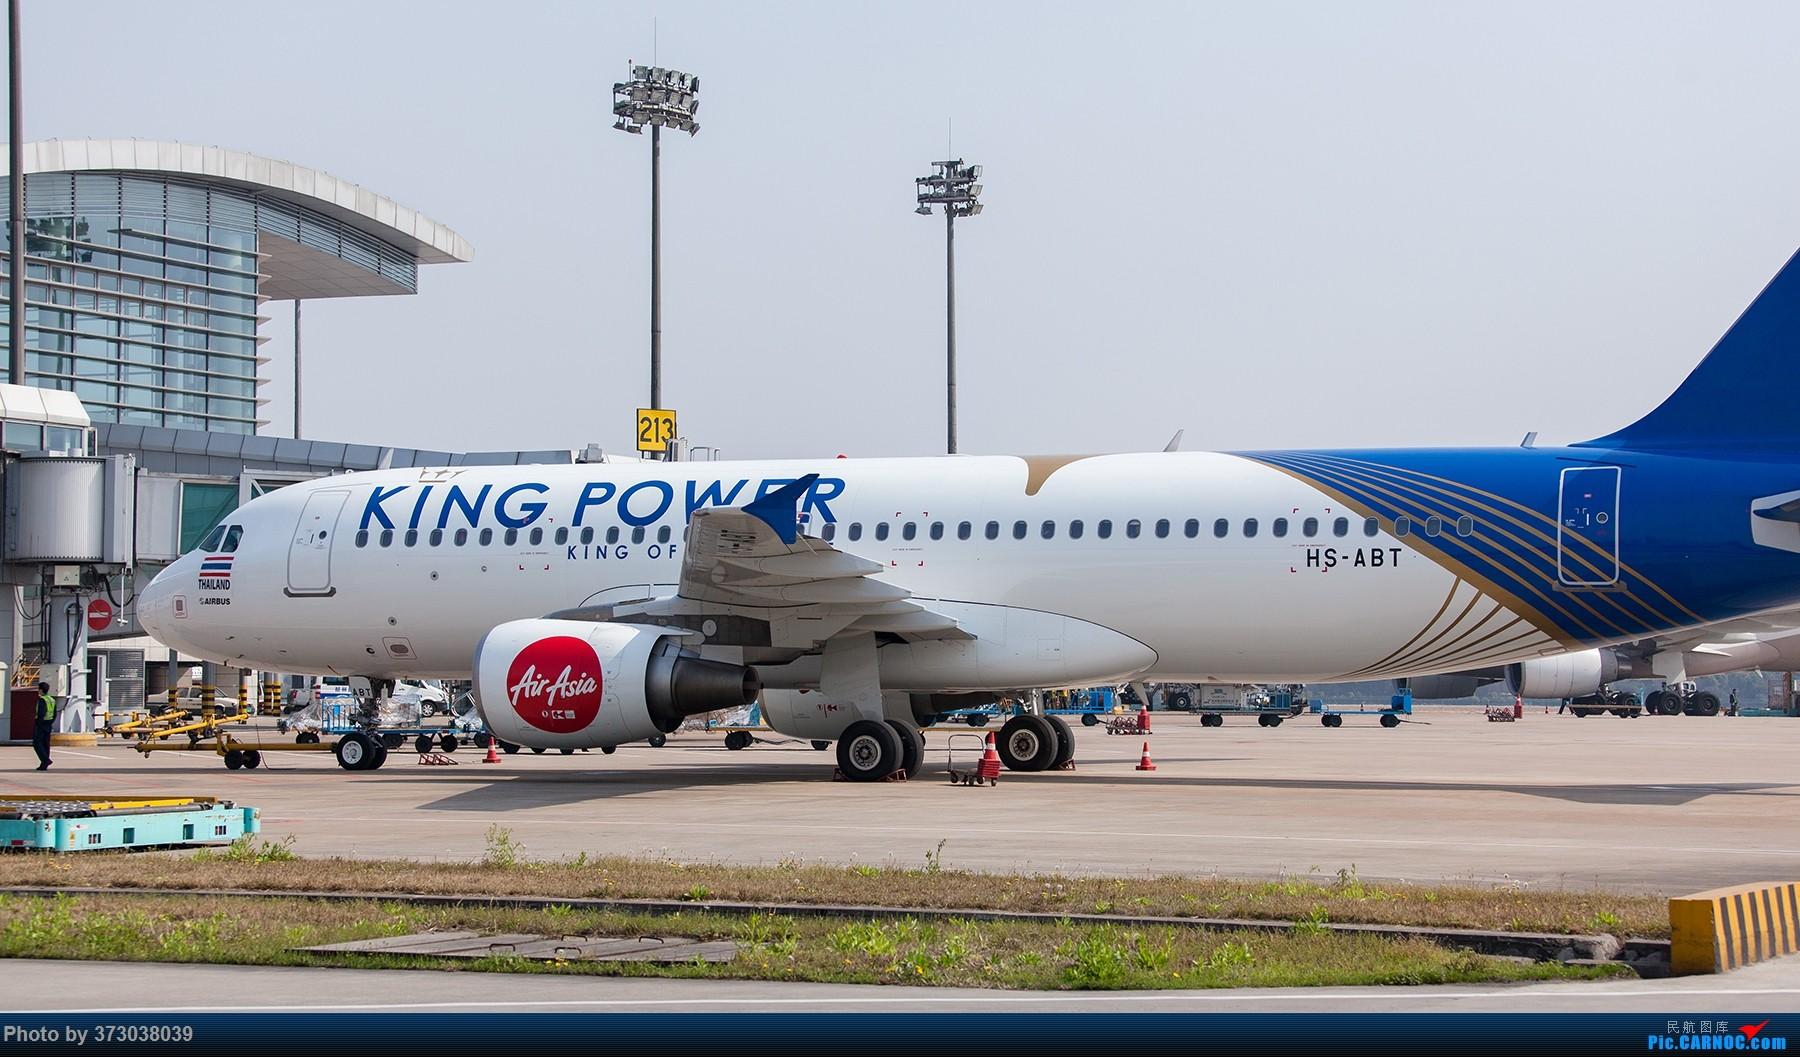 Re:[原创]HGH杭州萧山国际机场 落地的亚航KingPower彩绘机 美女机长 AIRBUS A320-200 HS-ABT 中国杭州萧山国际机场